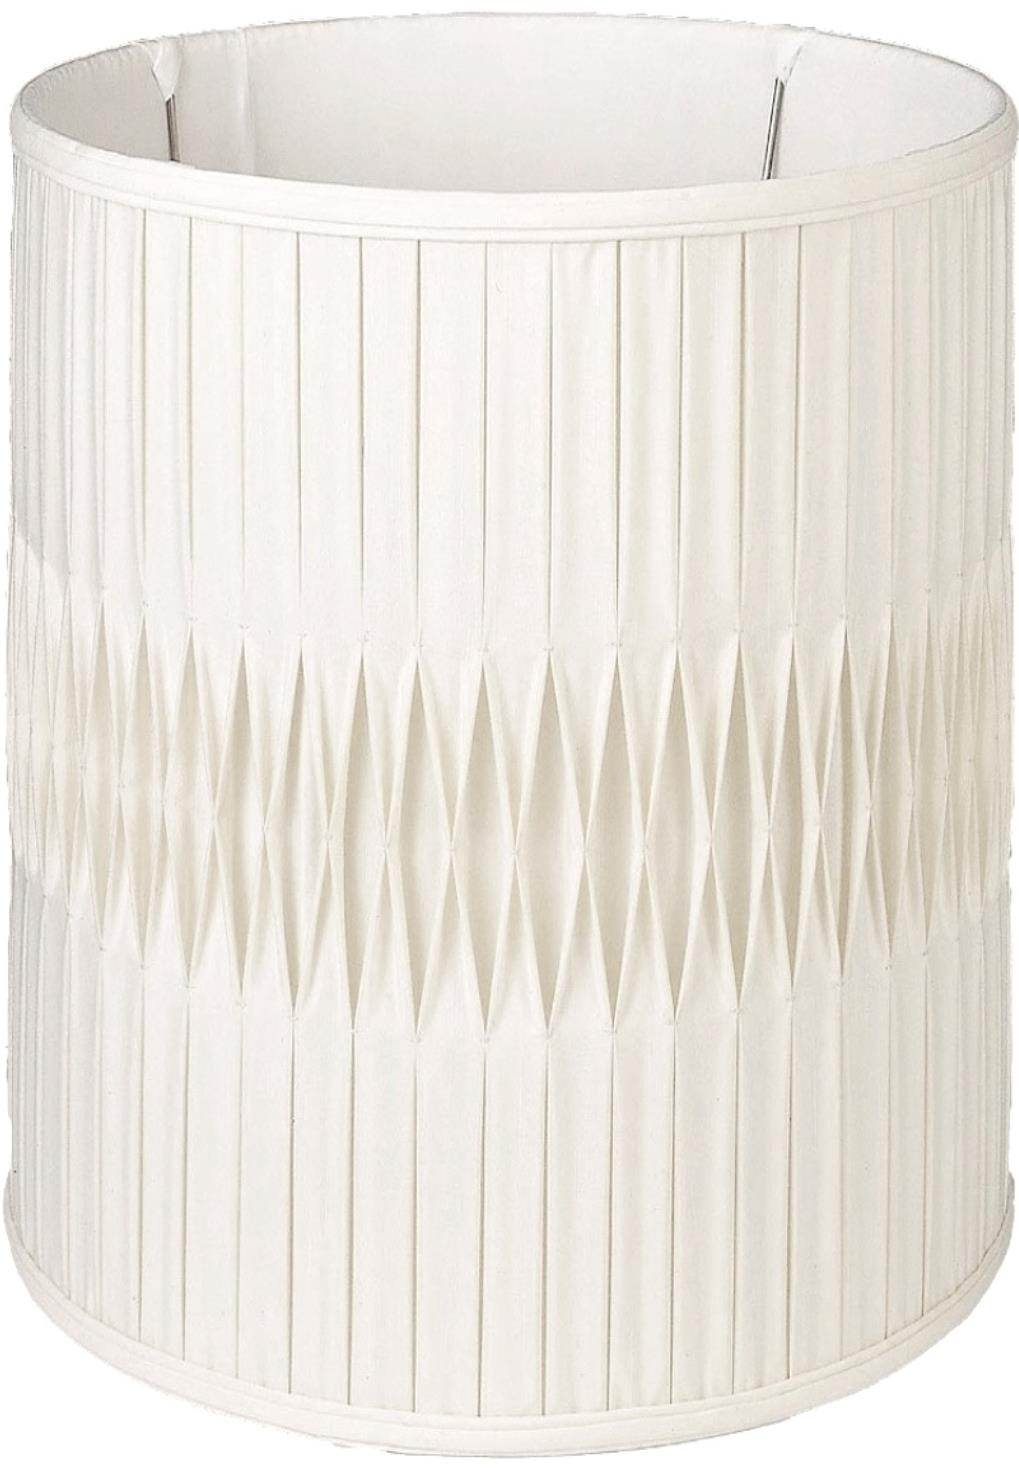 "Smock Pleated Silk Tall Drum Lamp Shade Cream, White 8-18""W"